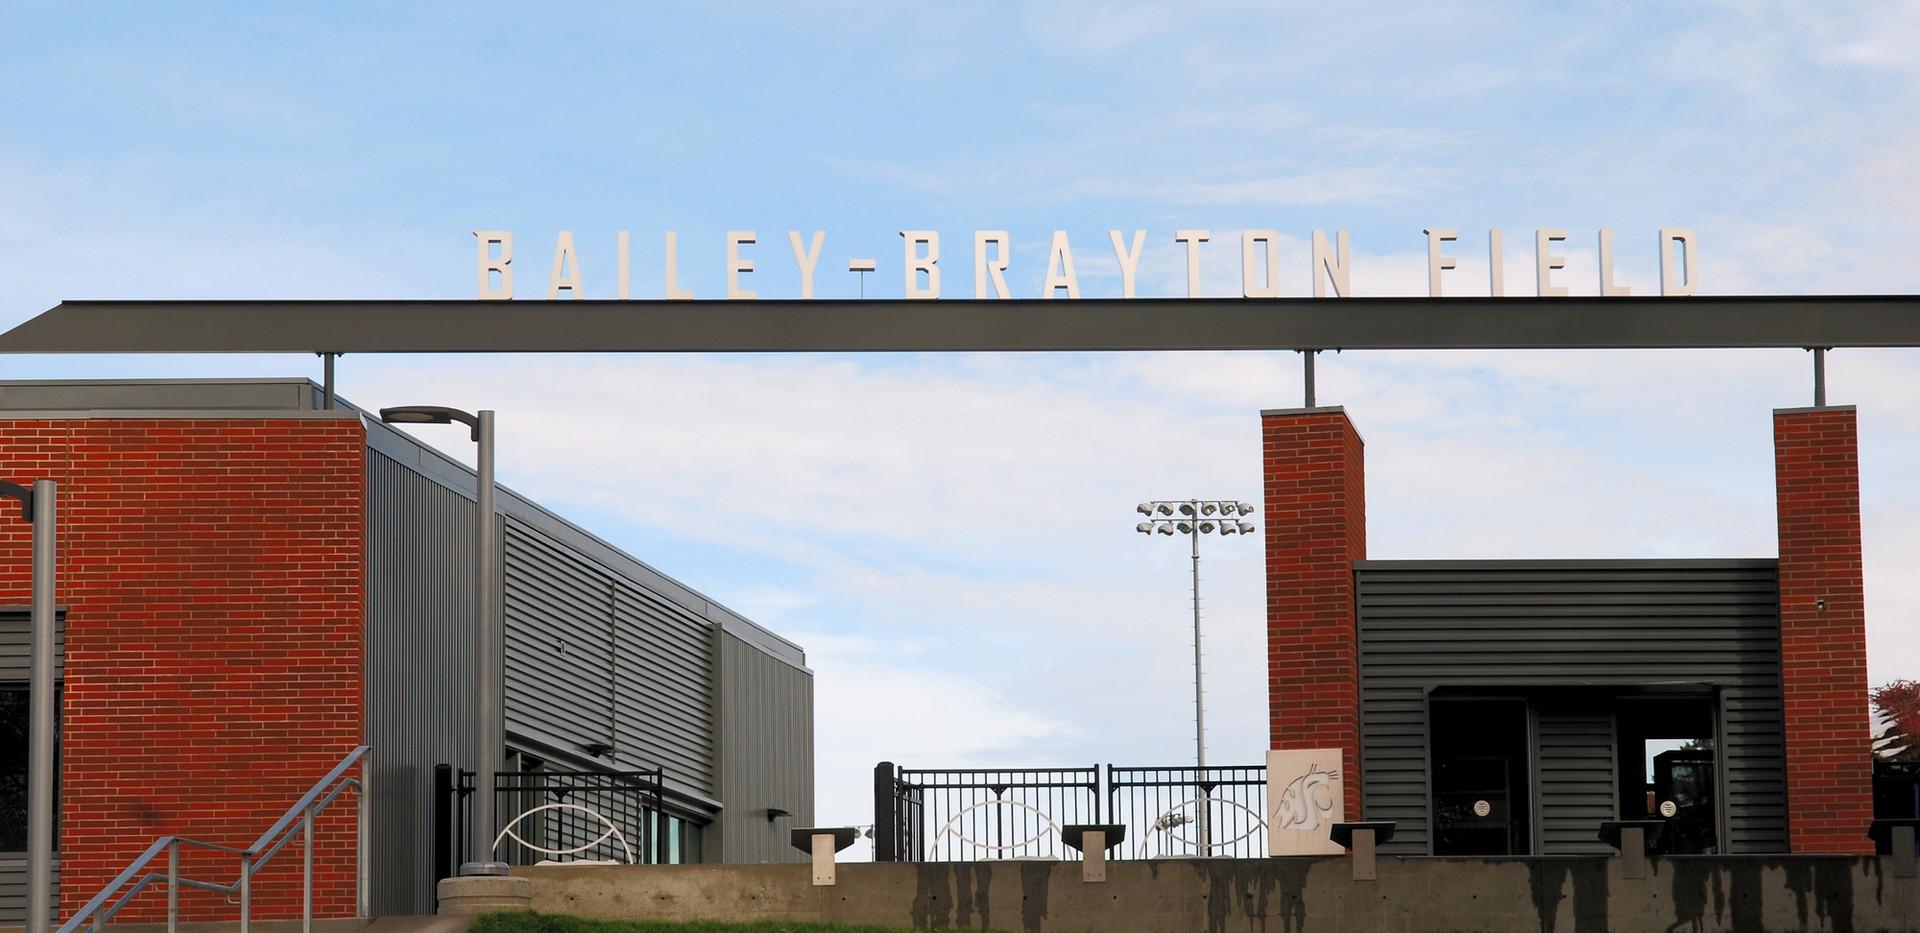 WSU Bailey-Brayton Field